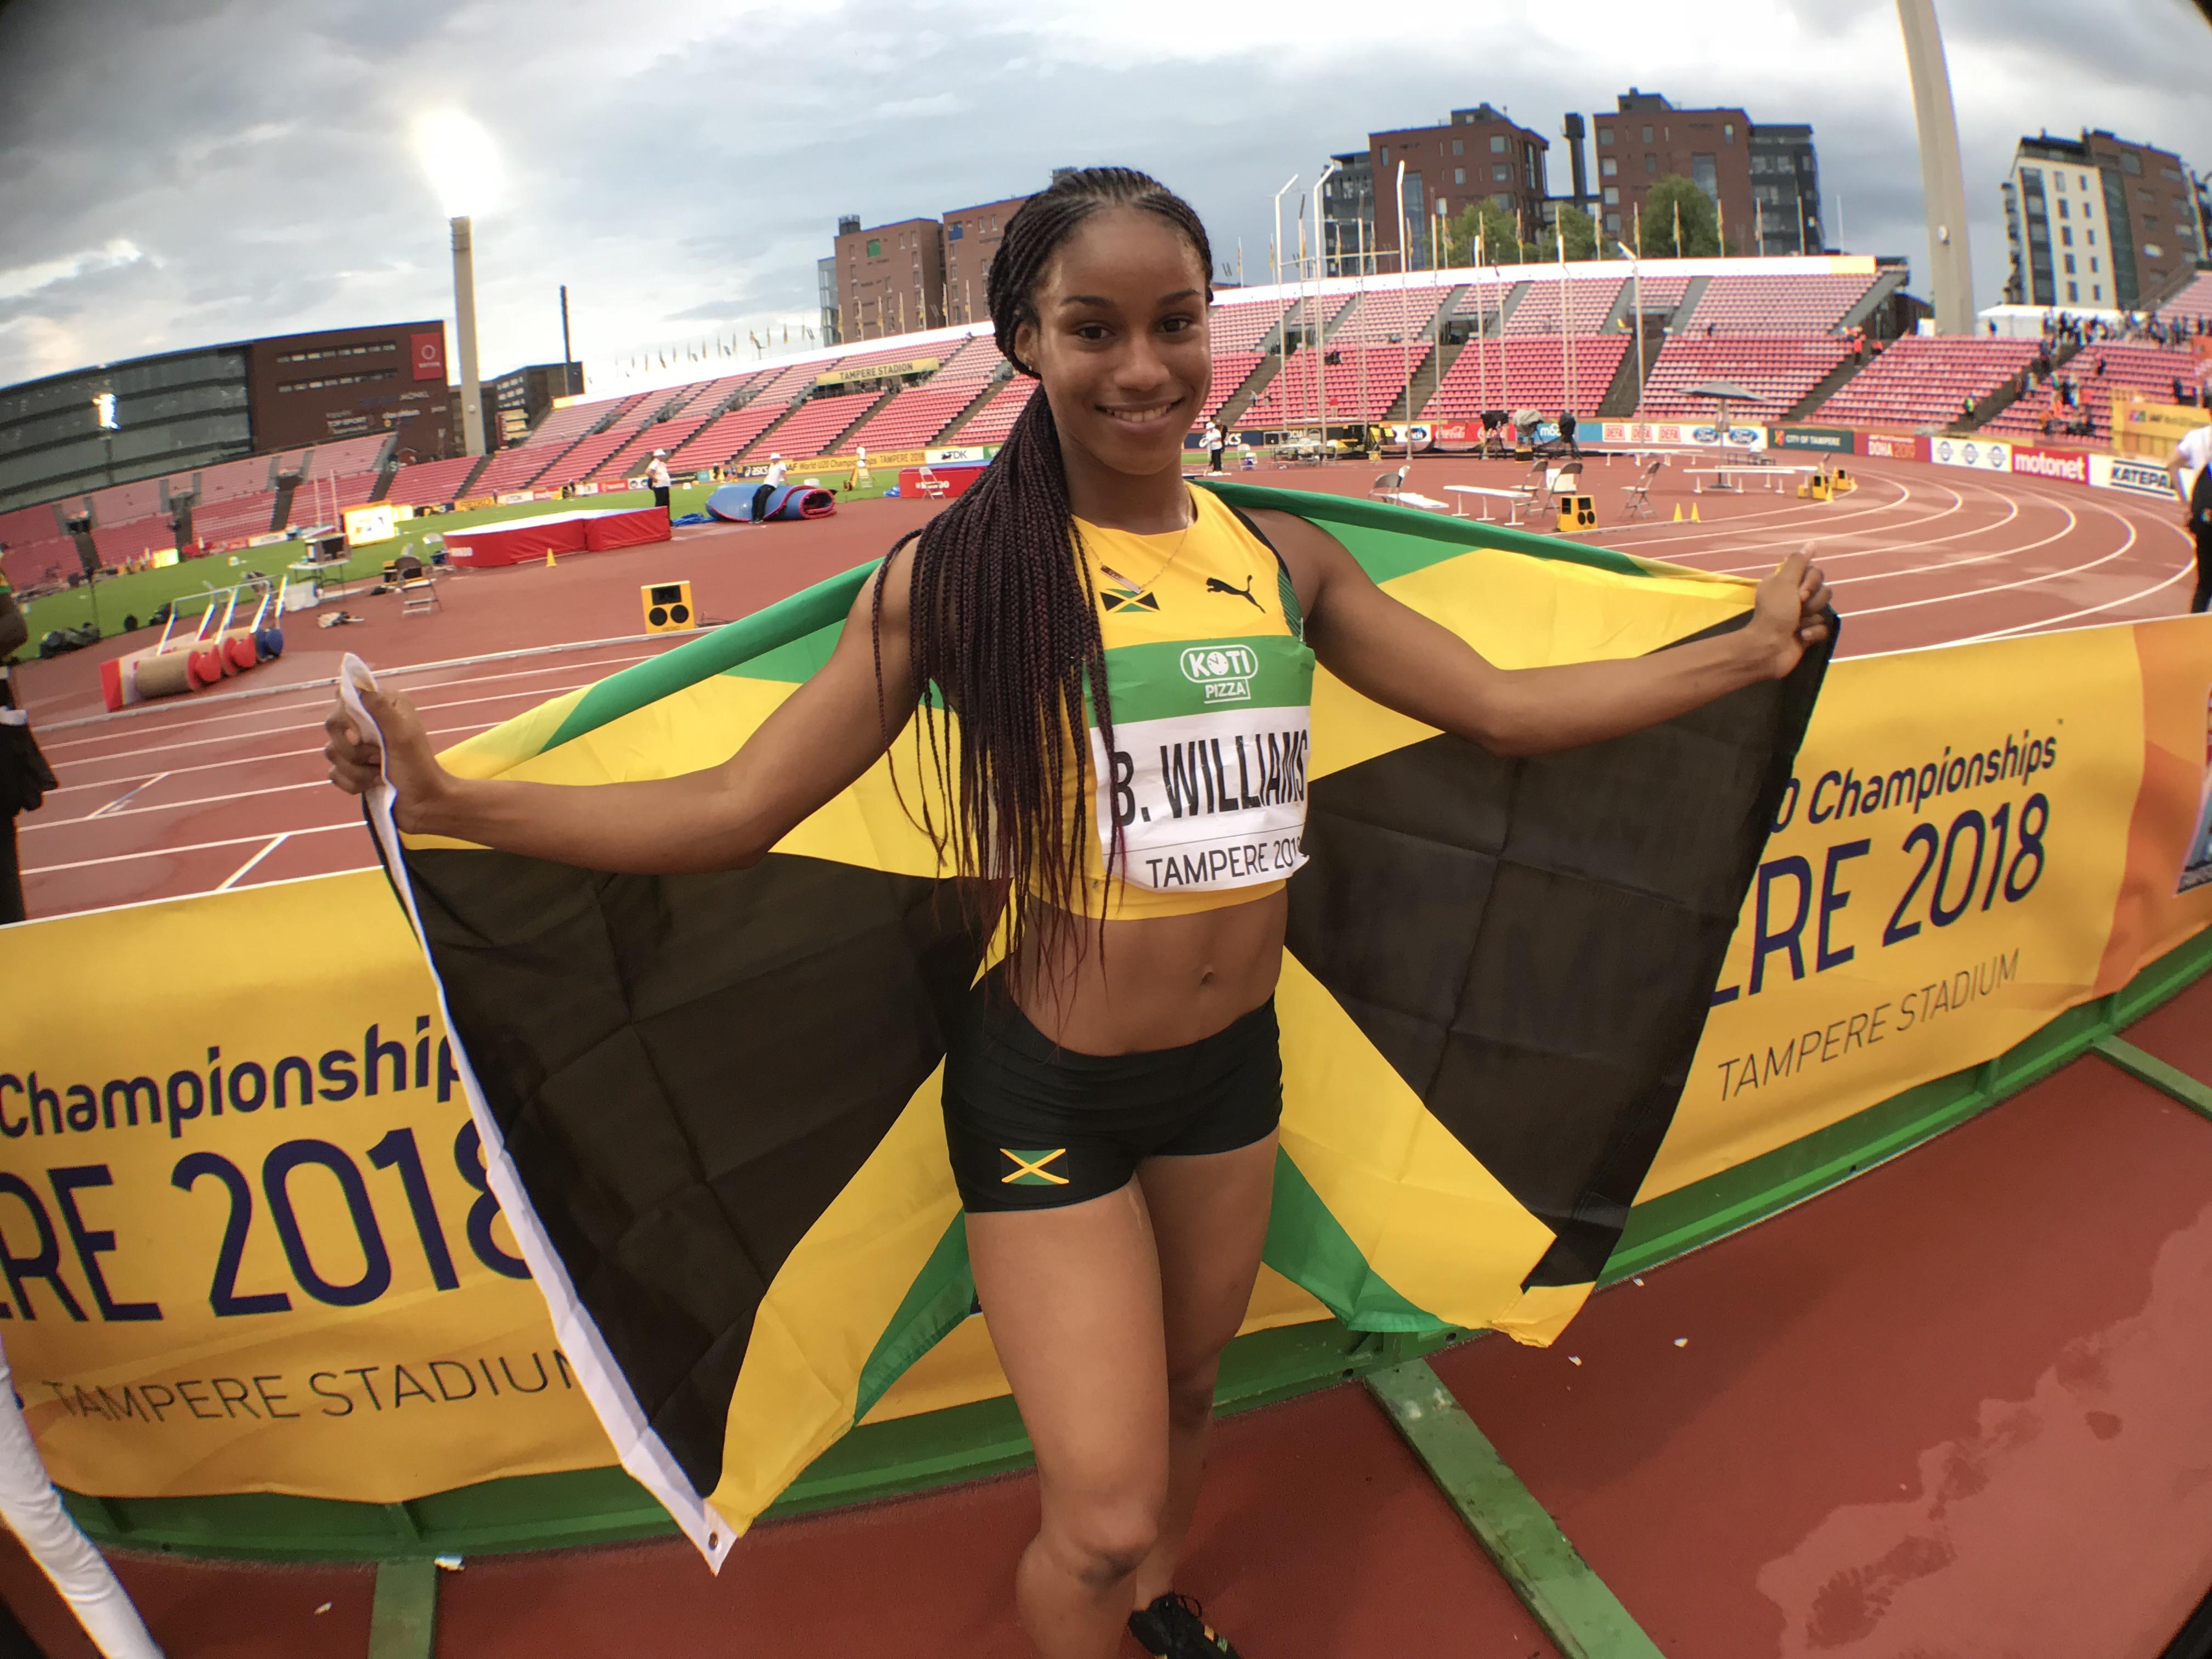 17-year-old Jamaican sprinter Briana Williams fails drugs testas diuretic Hydrochlorothiazide is found in her system